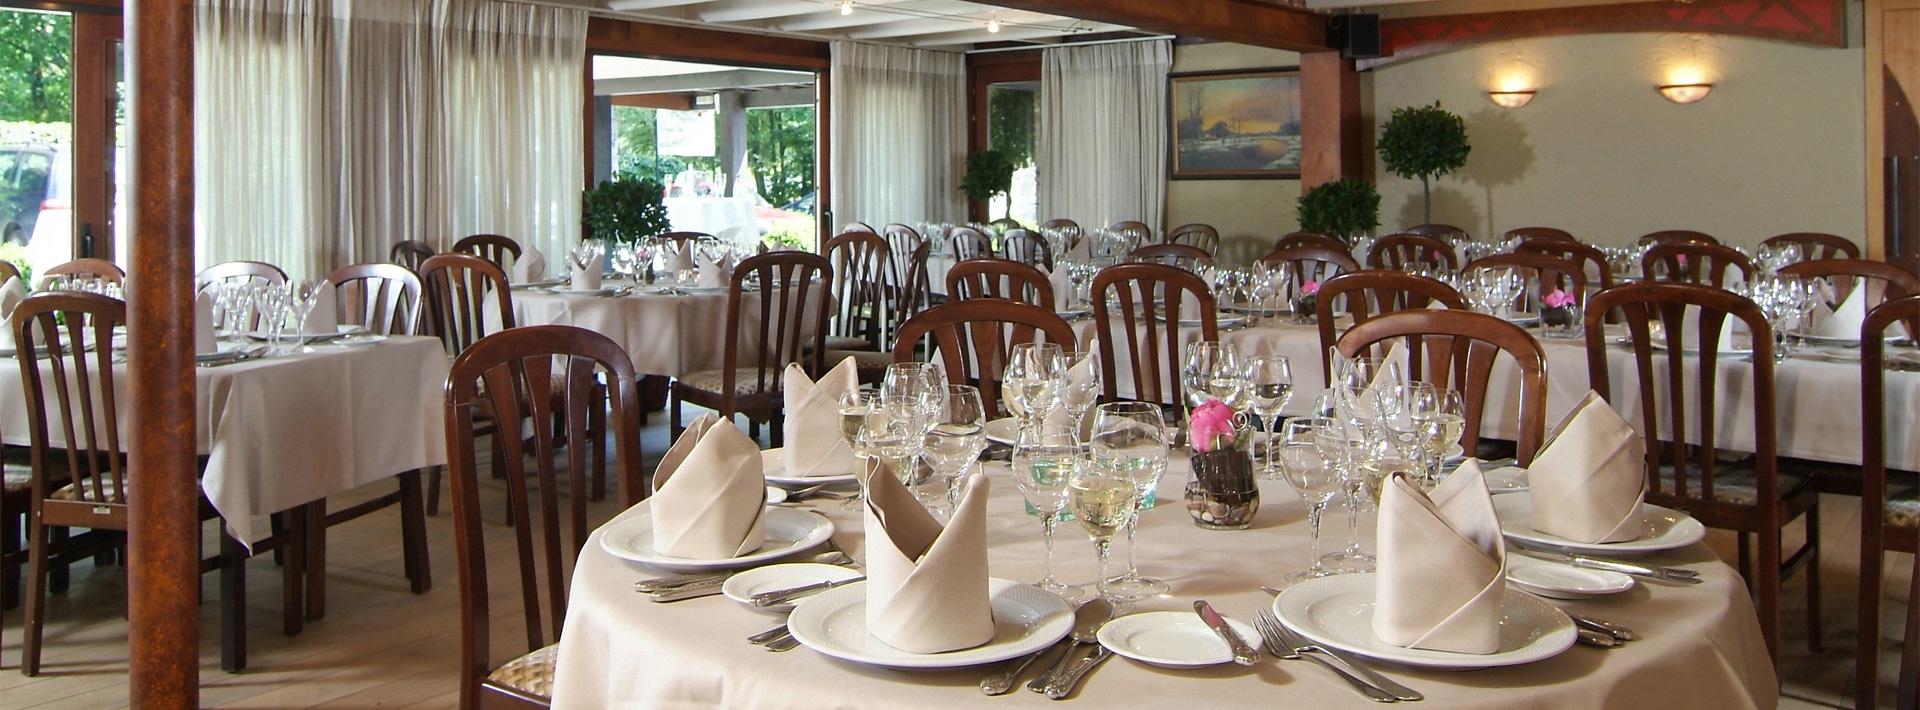 restaurant-malpertus-in-st-niklaas_DSCF2982